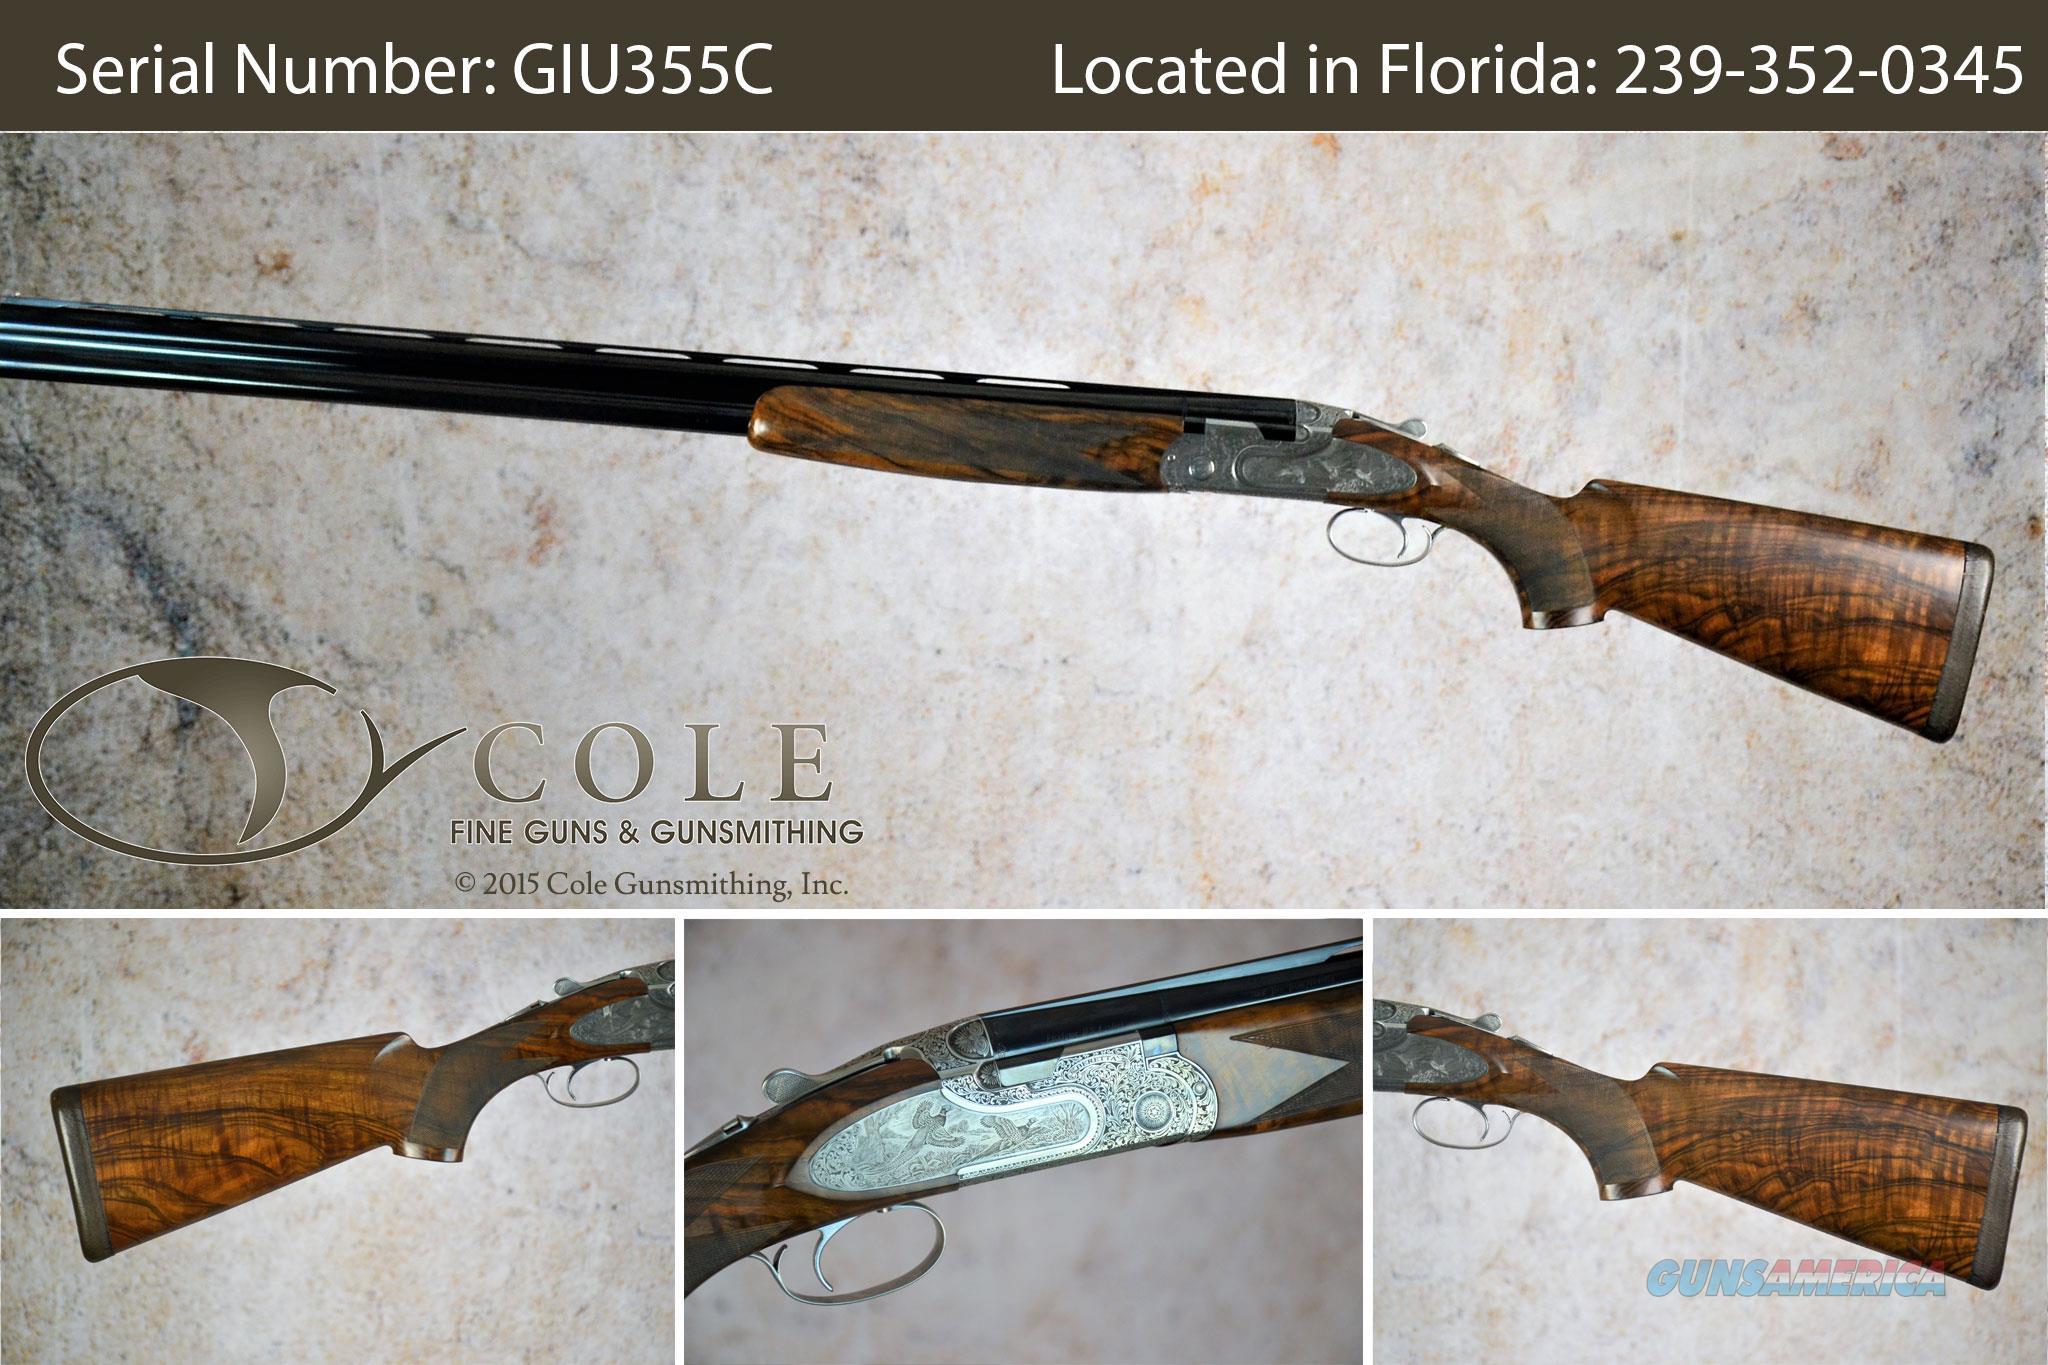 "Beretta Jubilee Sporting 12g 30"" SN#:GIU355C~~Pre-Owned~~  Guns > Shotguns > Beretta Shotguns > O/U > Trap/Skeet"